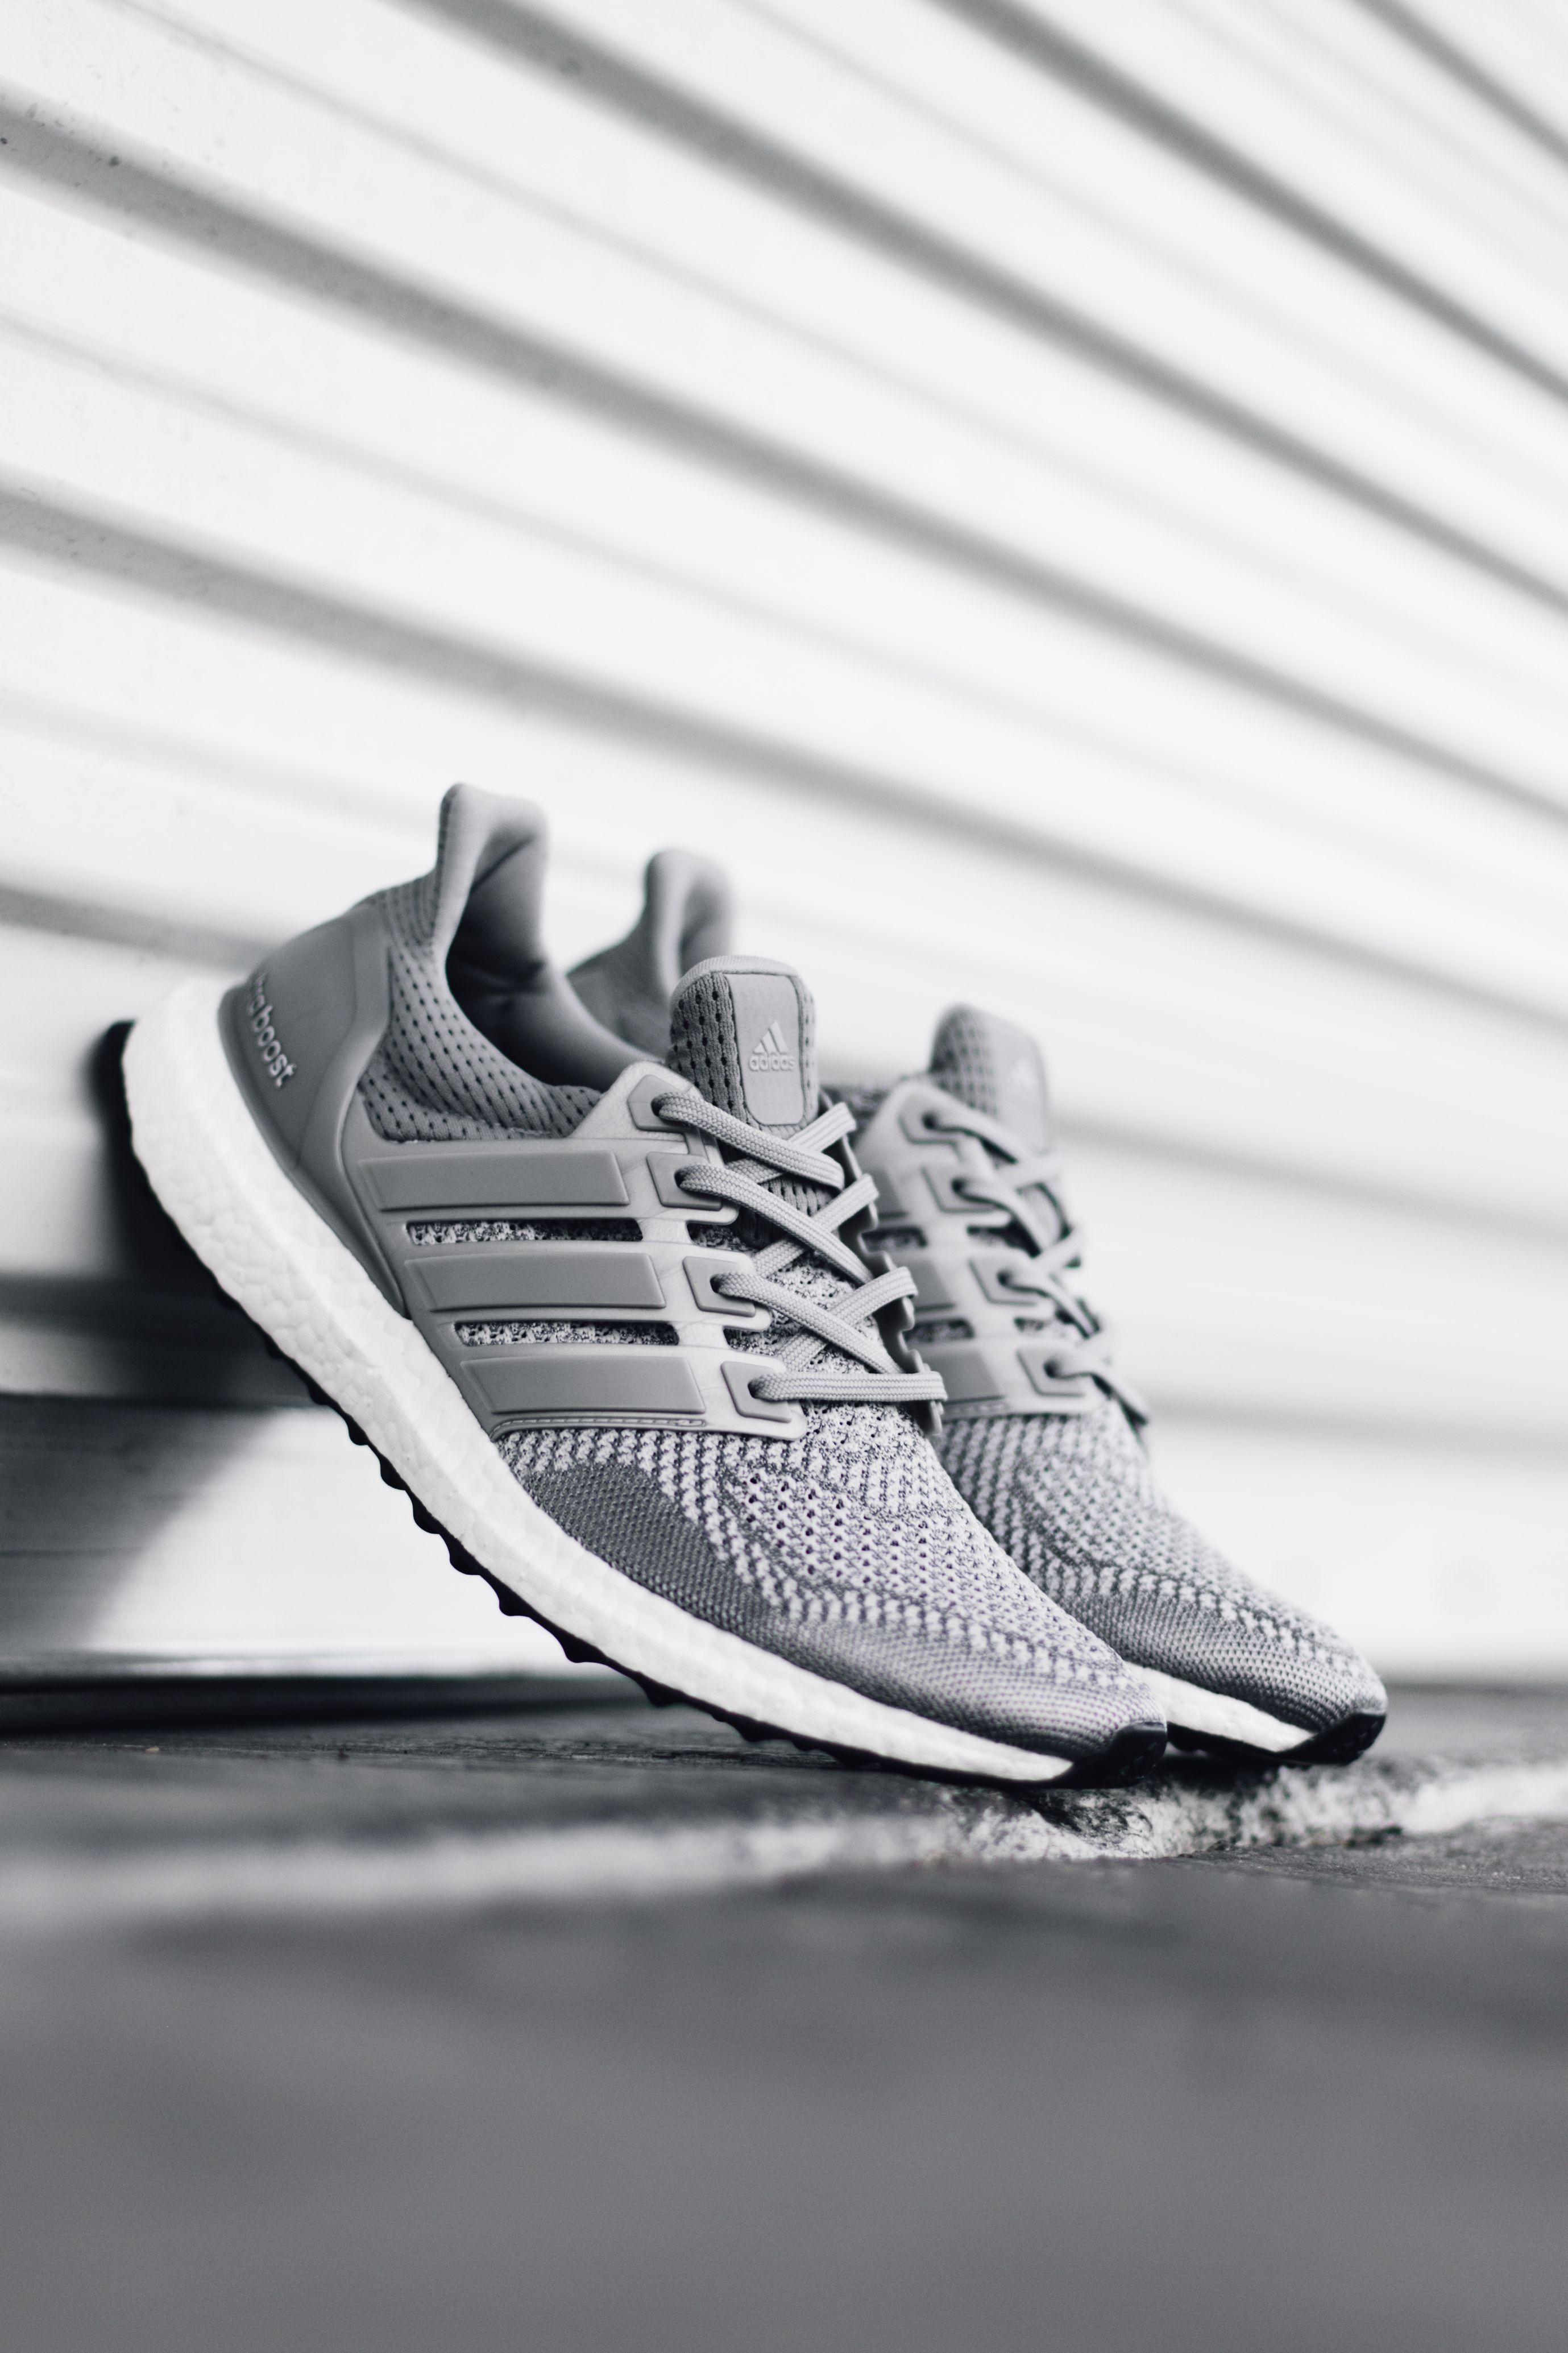 buy online 5ee81 079ca Adidas Originals Silver Metallic Ultra Boost Adidas UltraBoost Ultra  Fashion Streetwear Style Urban Lookbook Photography Footwear  Sneakers ...